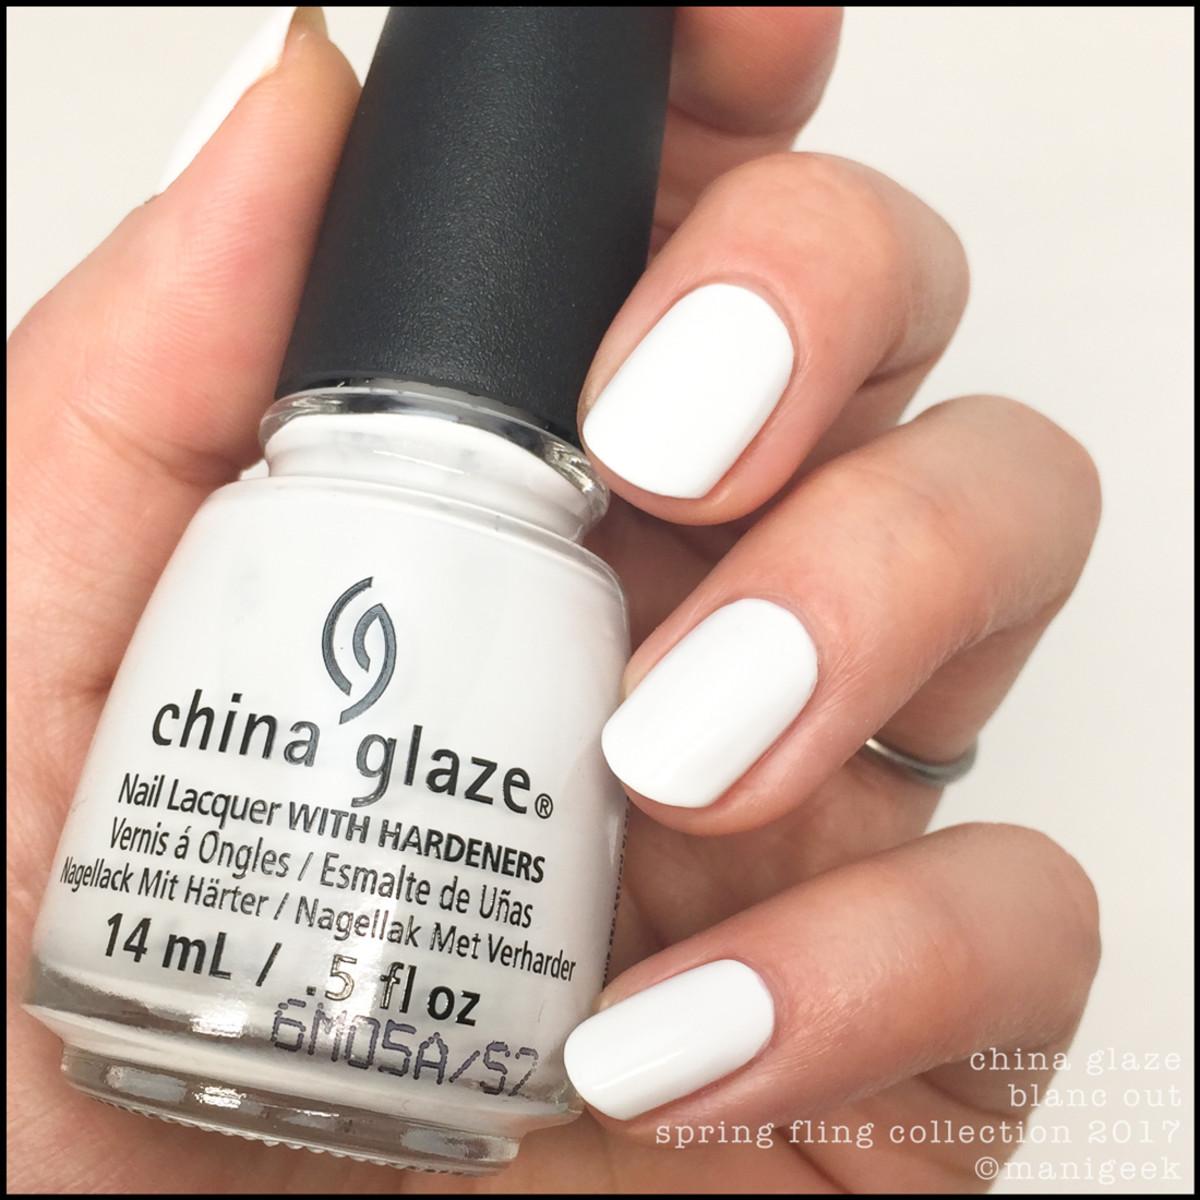 China Glaze Blanc Out 1_China Glaze Spring Fling 2017